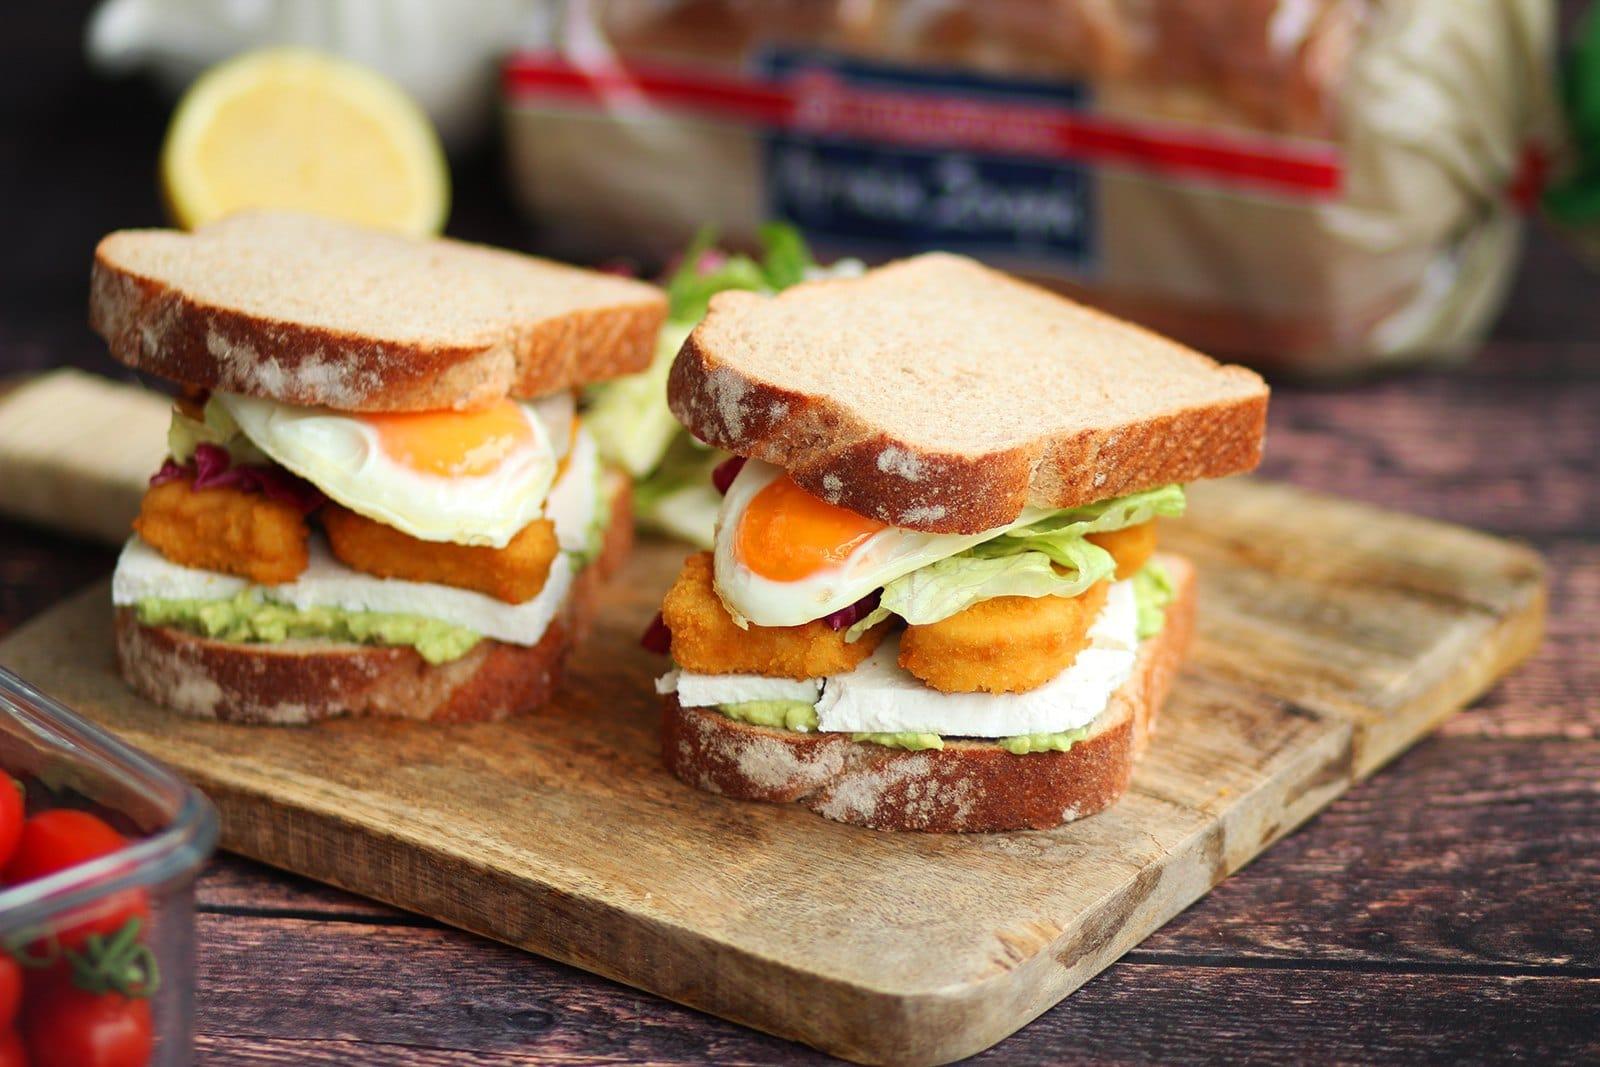 Featured image for Brunch με Αρχαία Σπορά με δίκοκκο σιτάρι ολικής, αβοκάντο, κοτόπουλο και αυγό